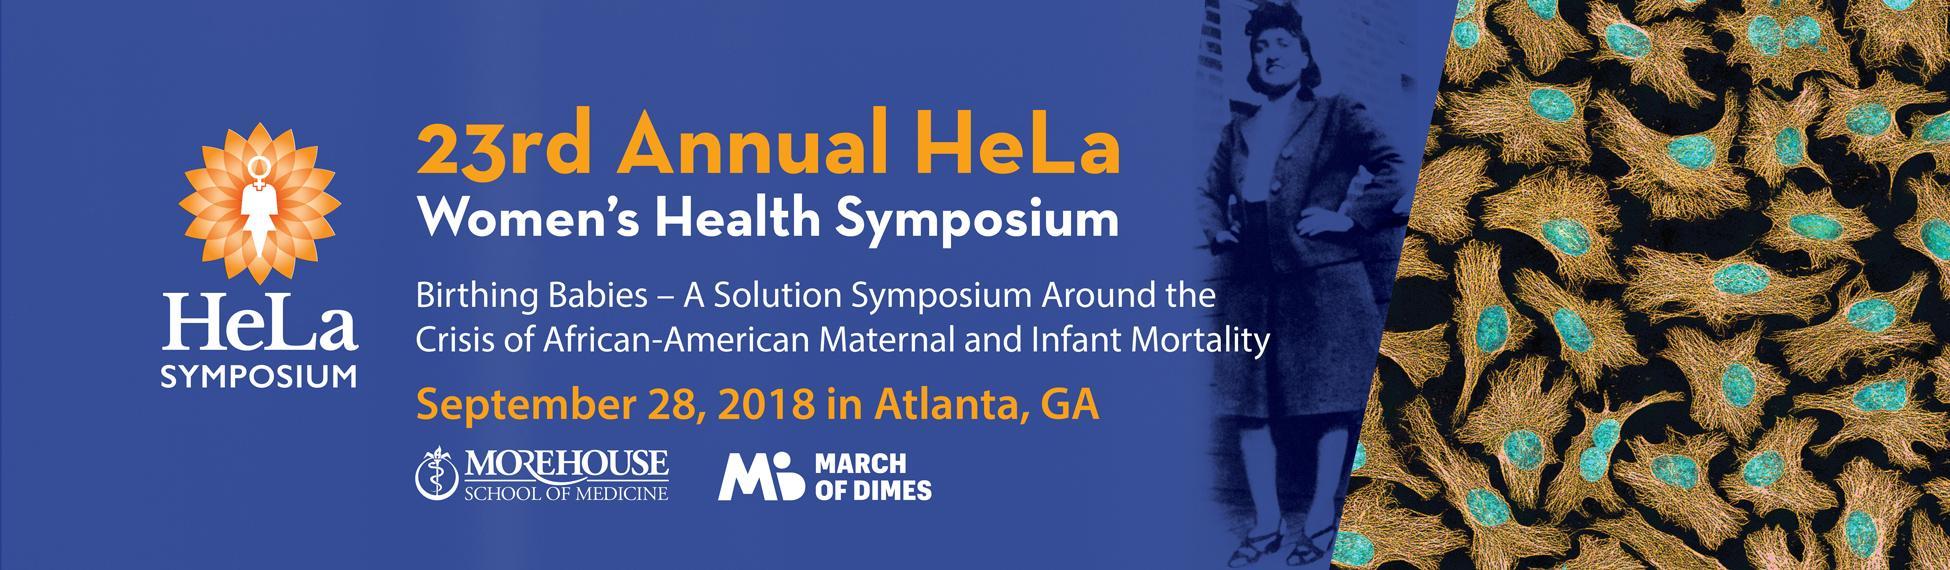 23rd Annual HeLa Women's Health Symposium